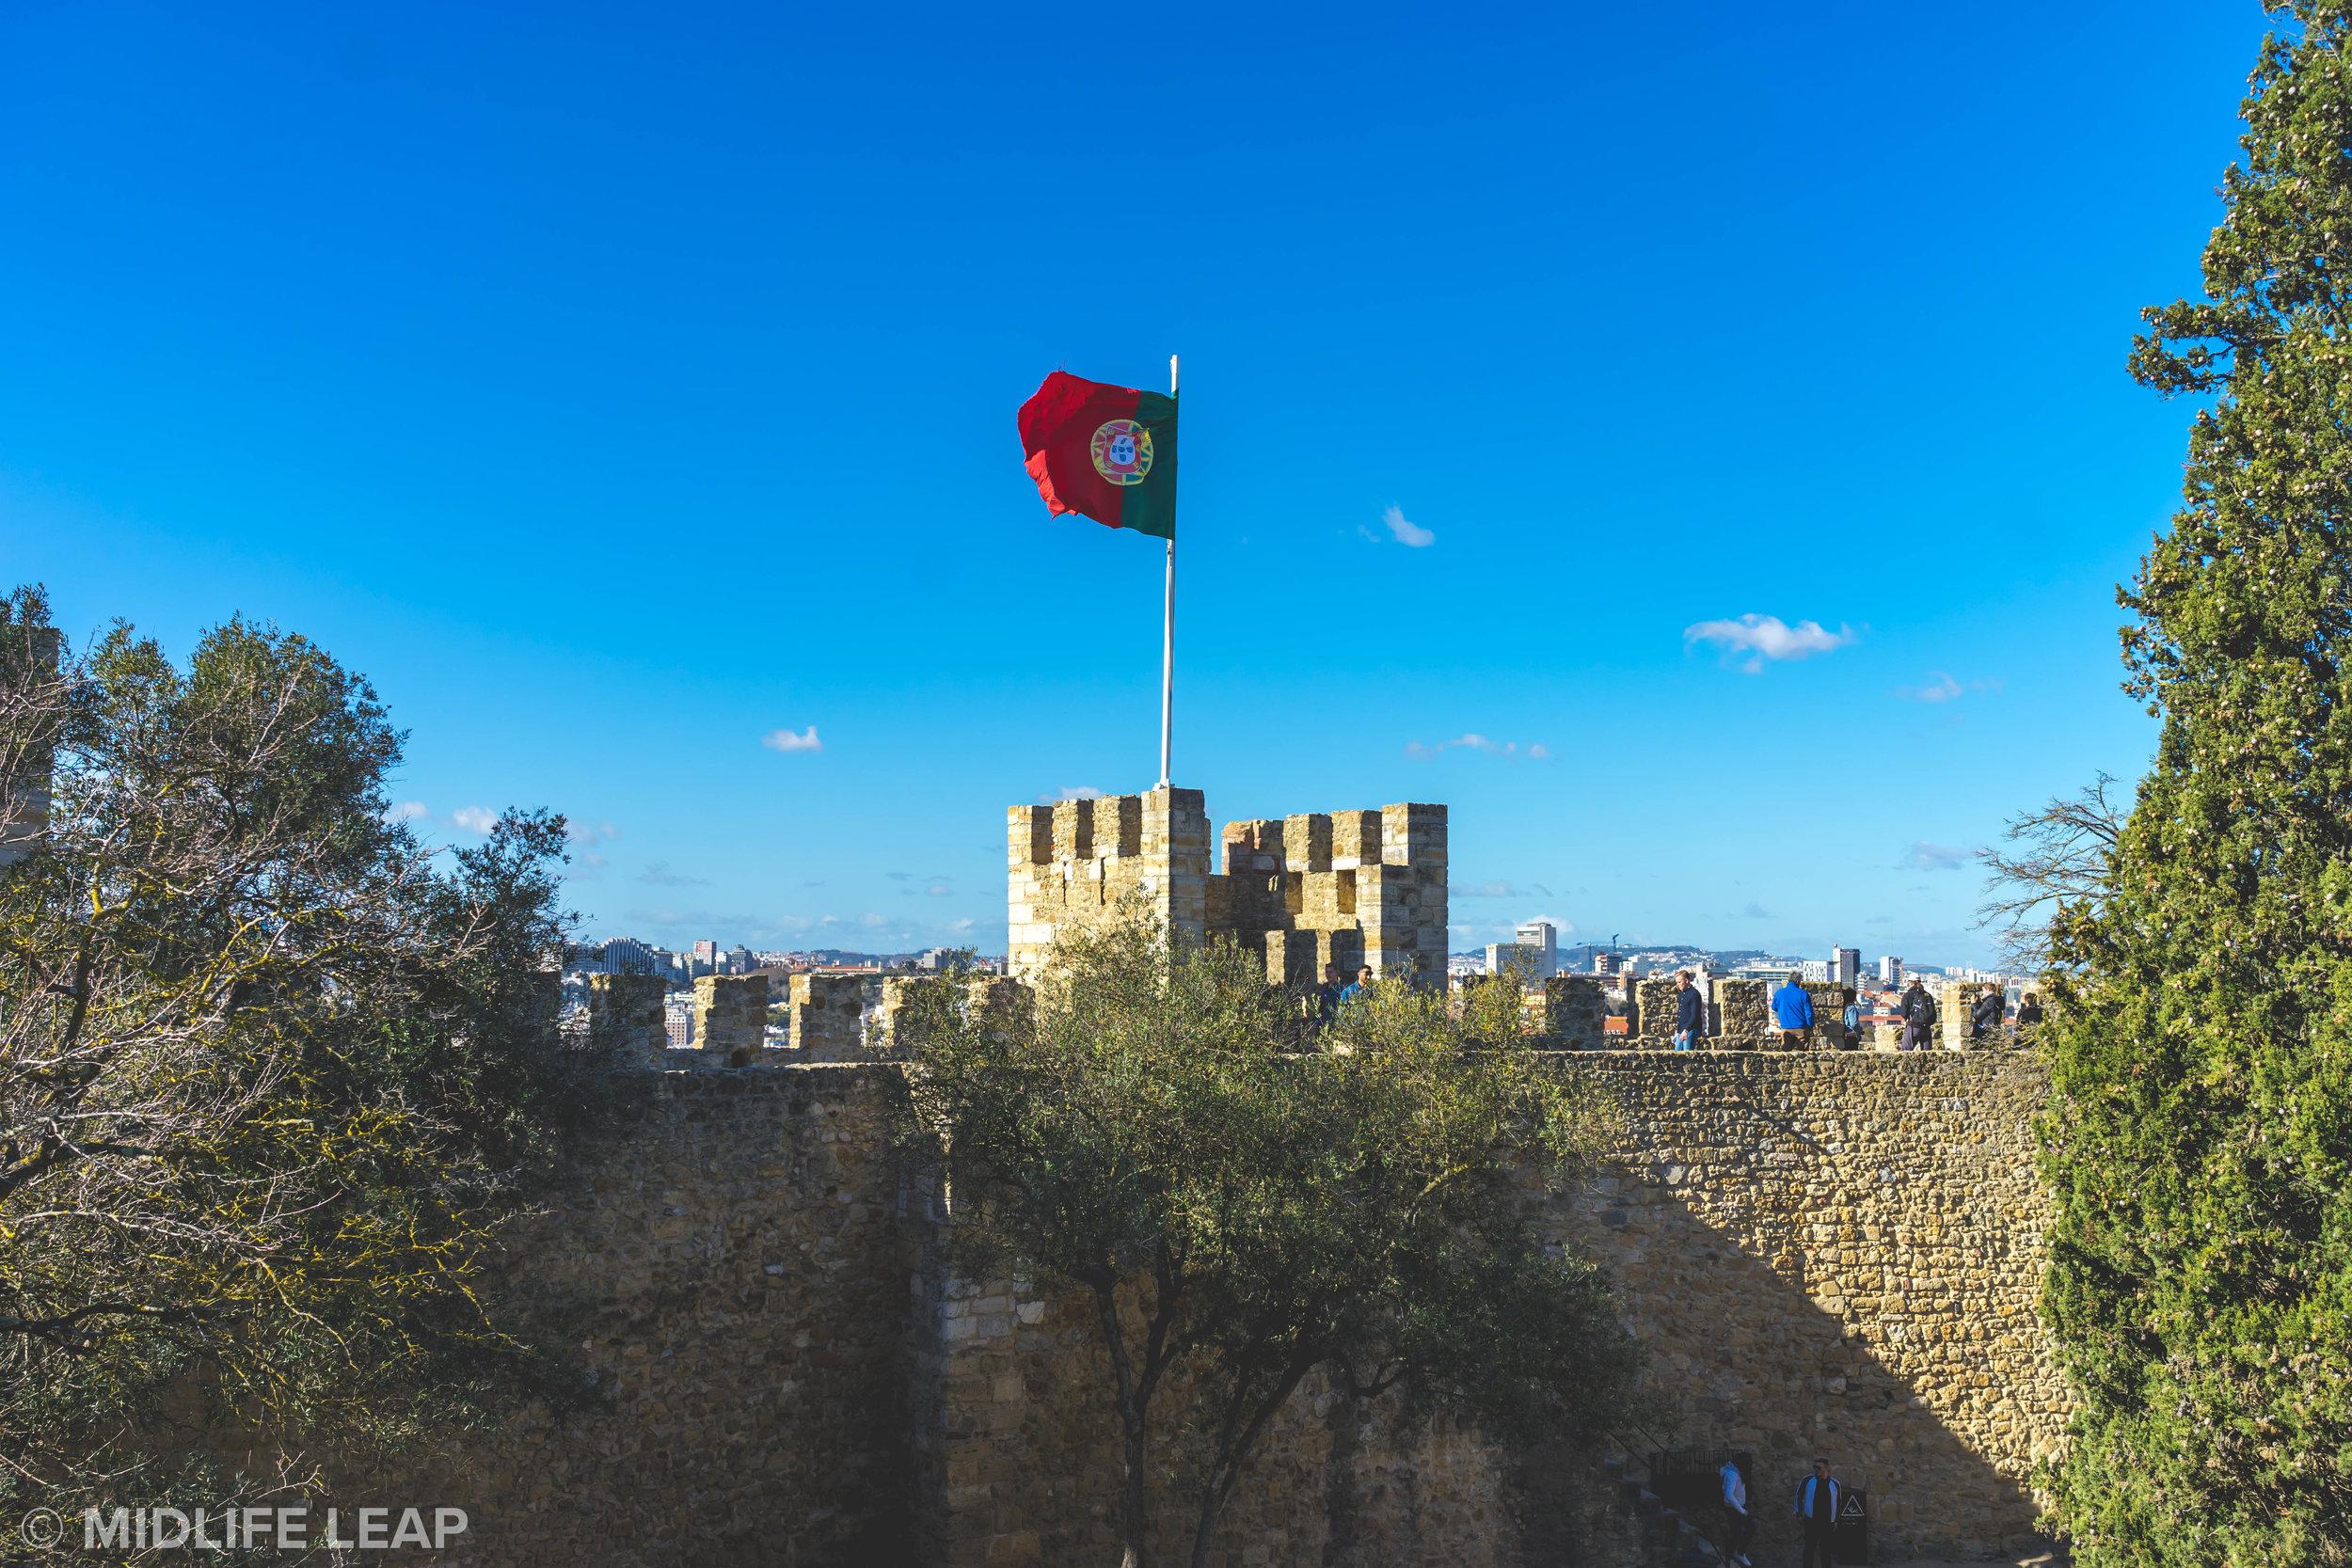 castelo-de-sao-jorge-what-to-do-in-lisbon